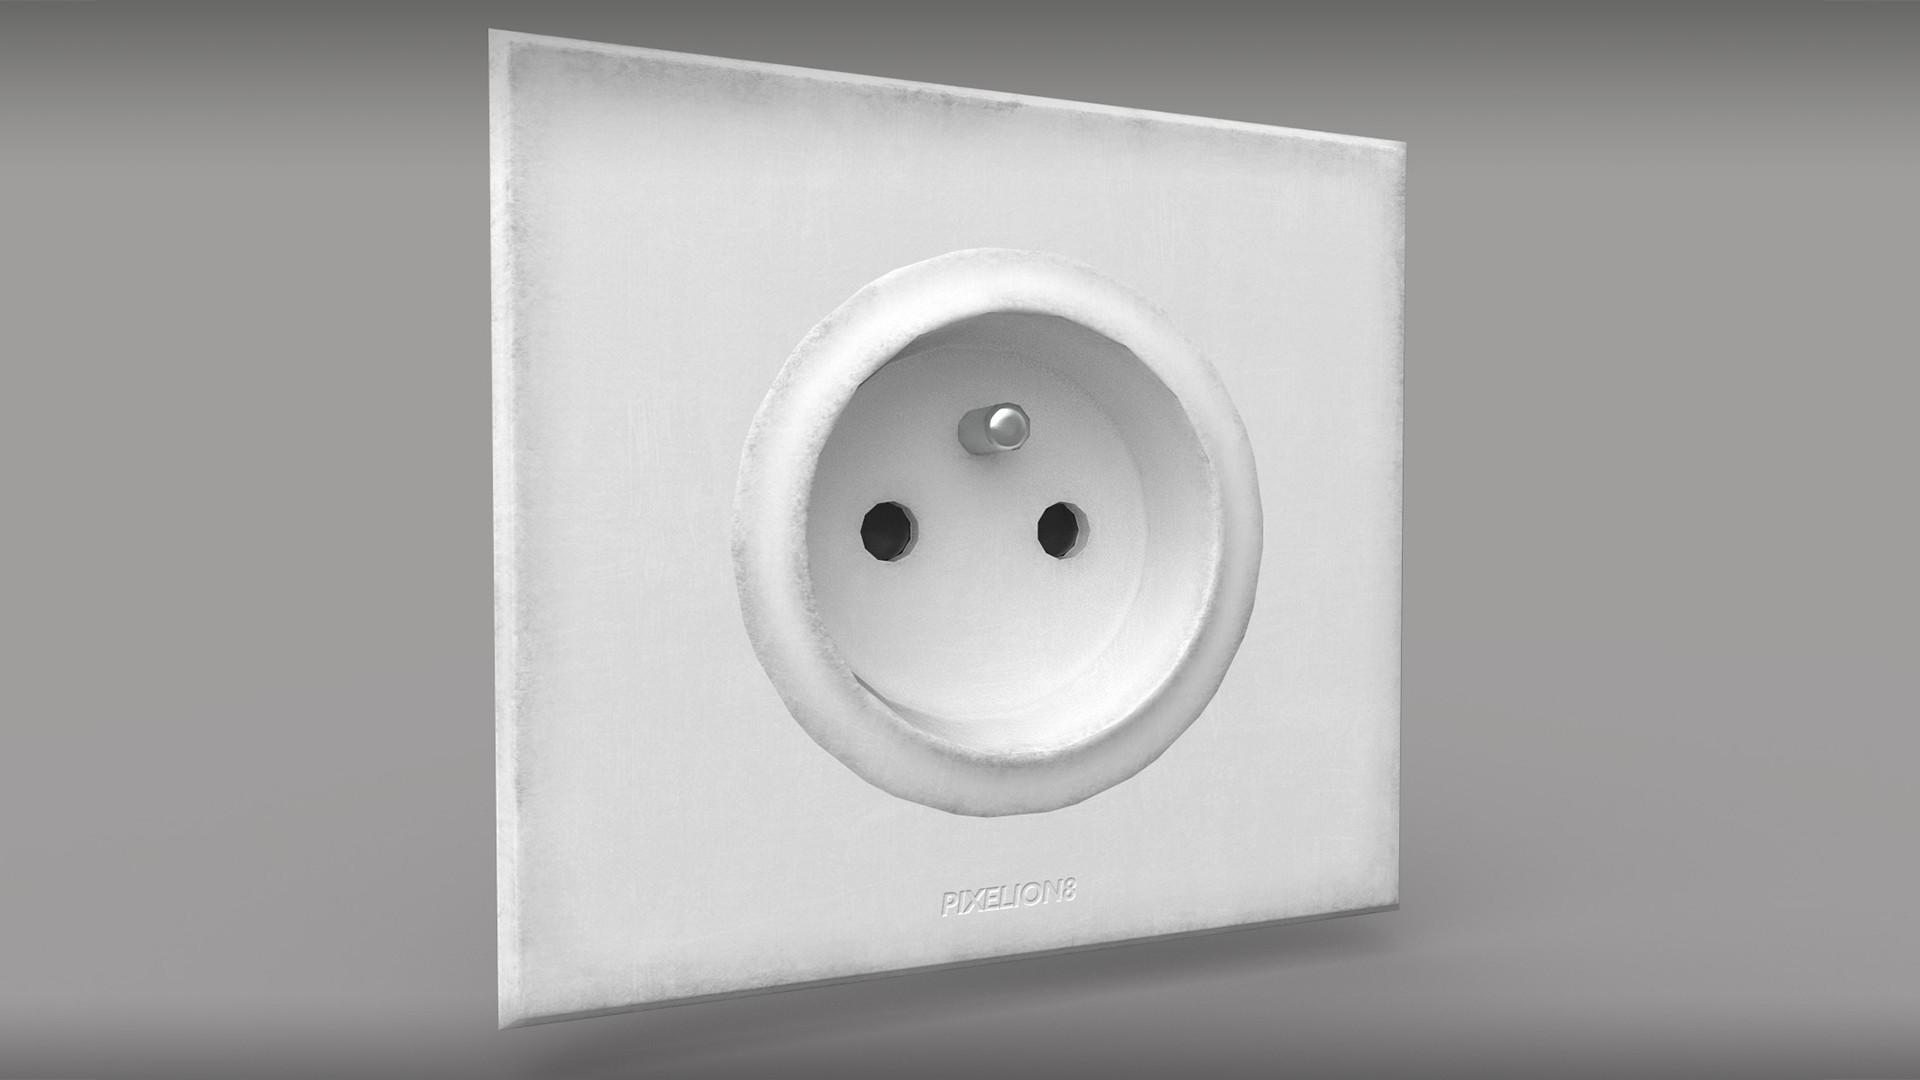 electrical outlet - 3D model by pixelion8 (@pixelion8) - Sketchfab